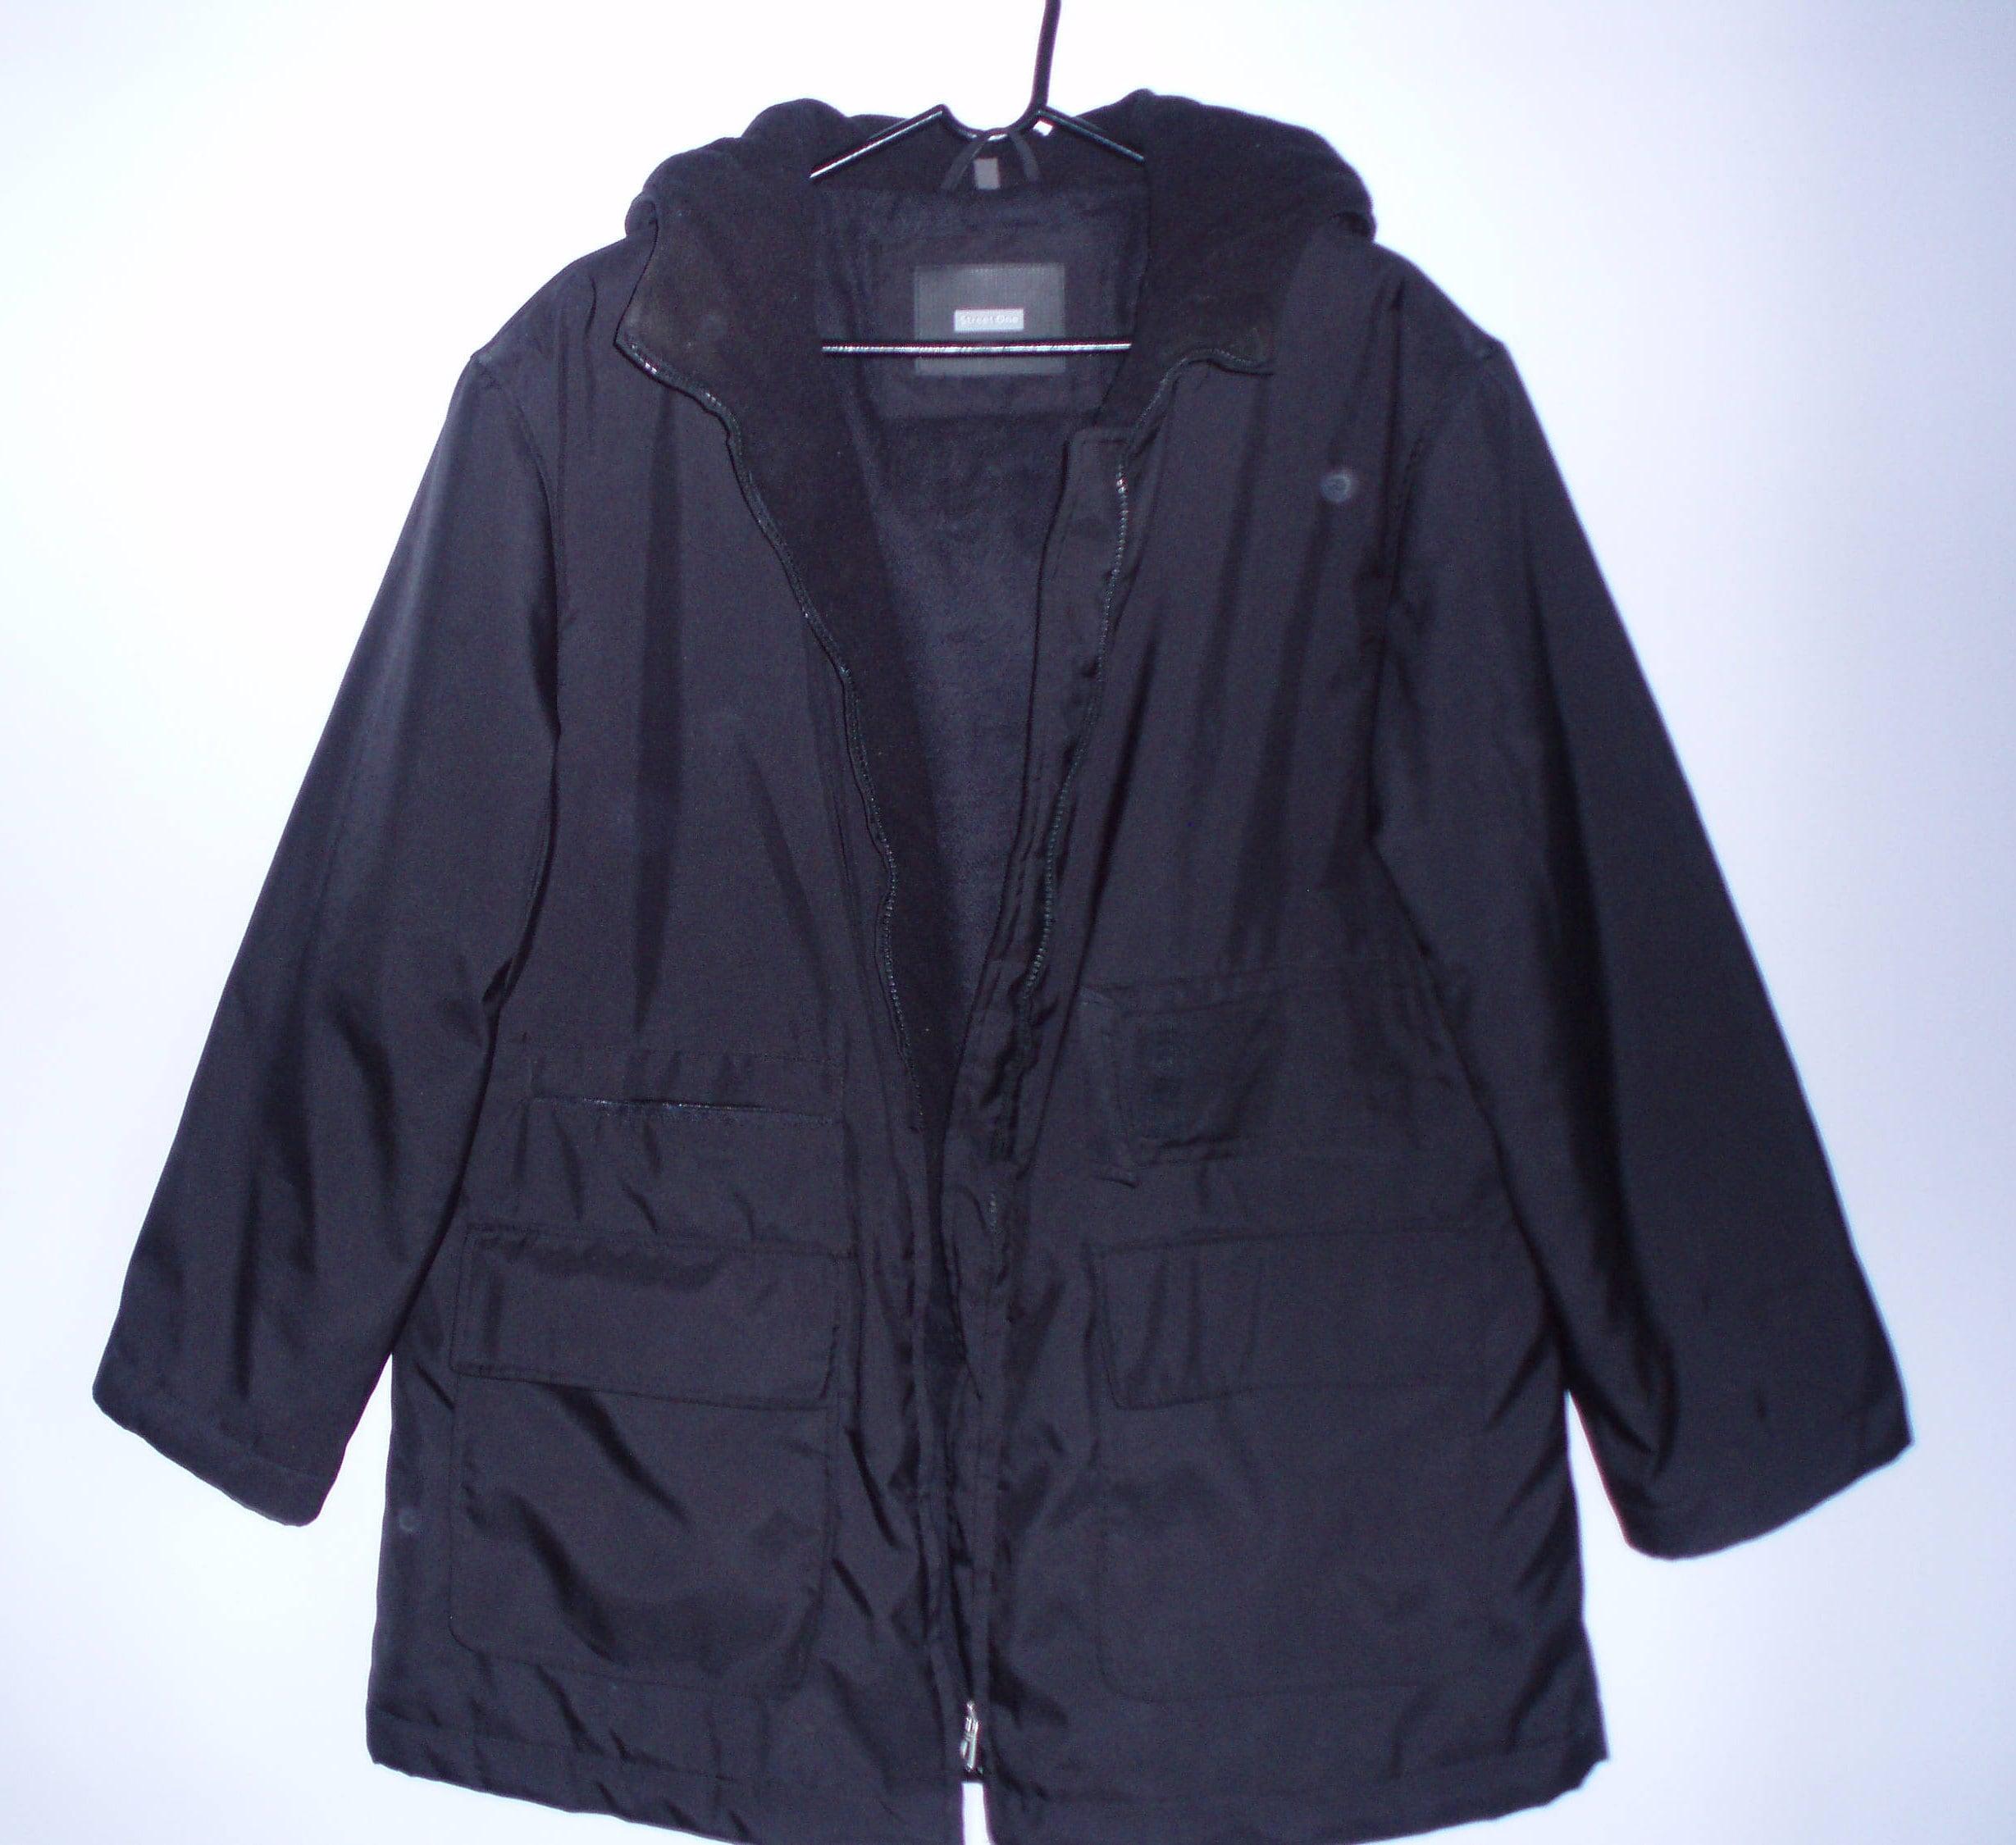 AVIATORS ACADEMY Gallice jacket with zipper 2U9VHhyypa